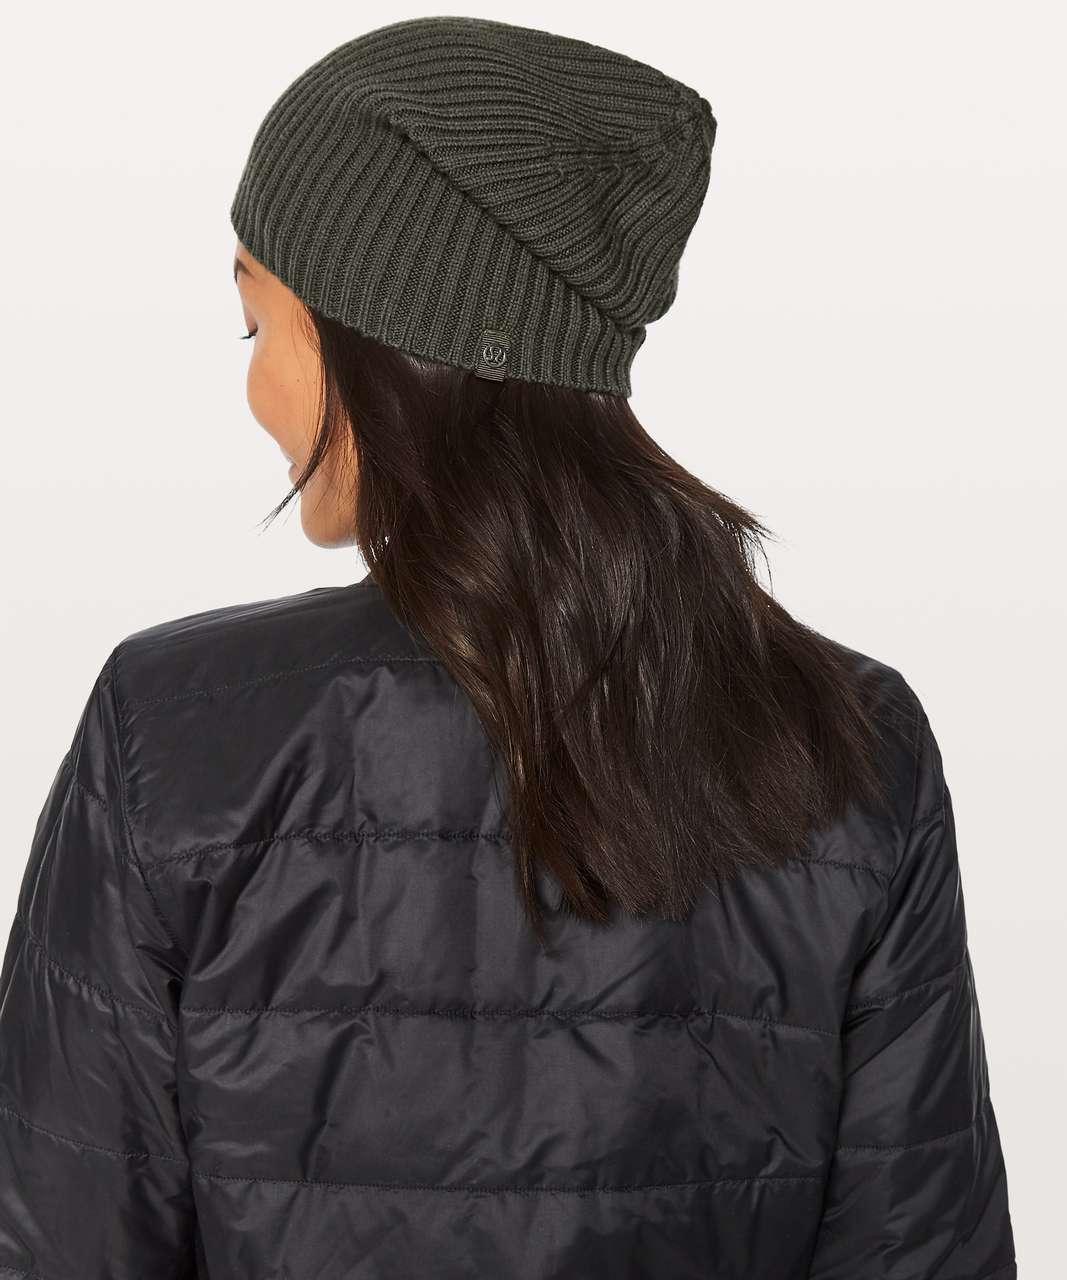 Lululemon Wool Be Cozy Toque - Dark Olive